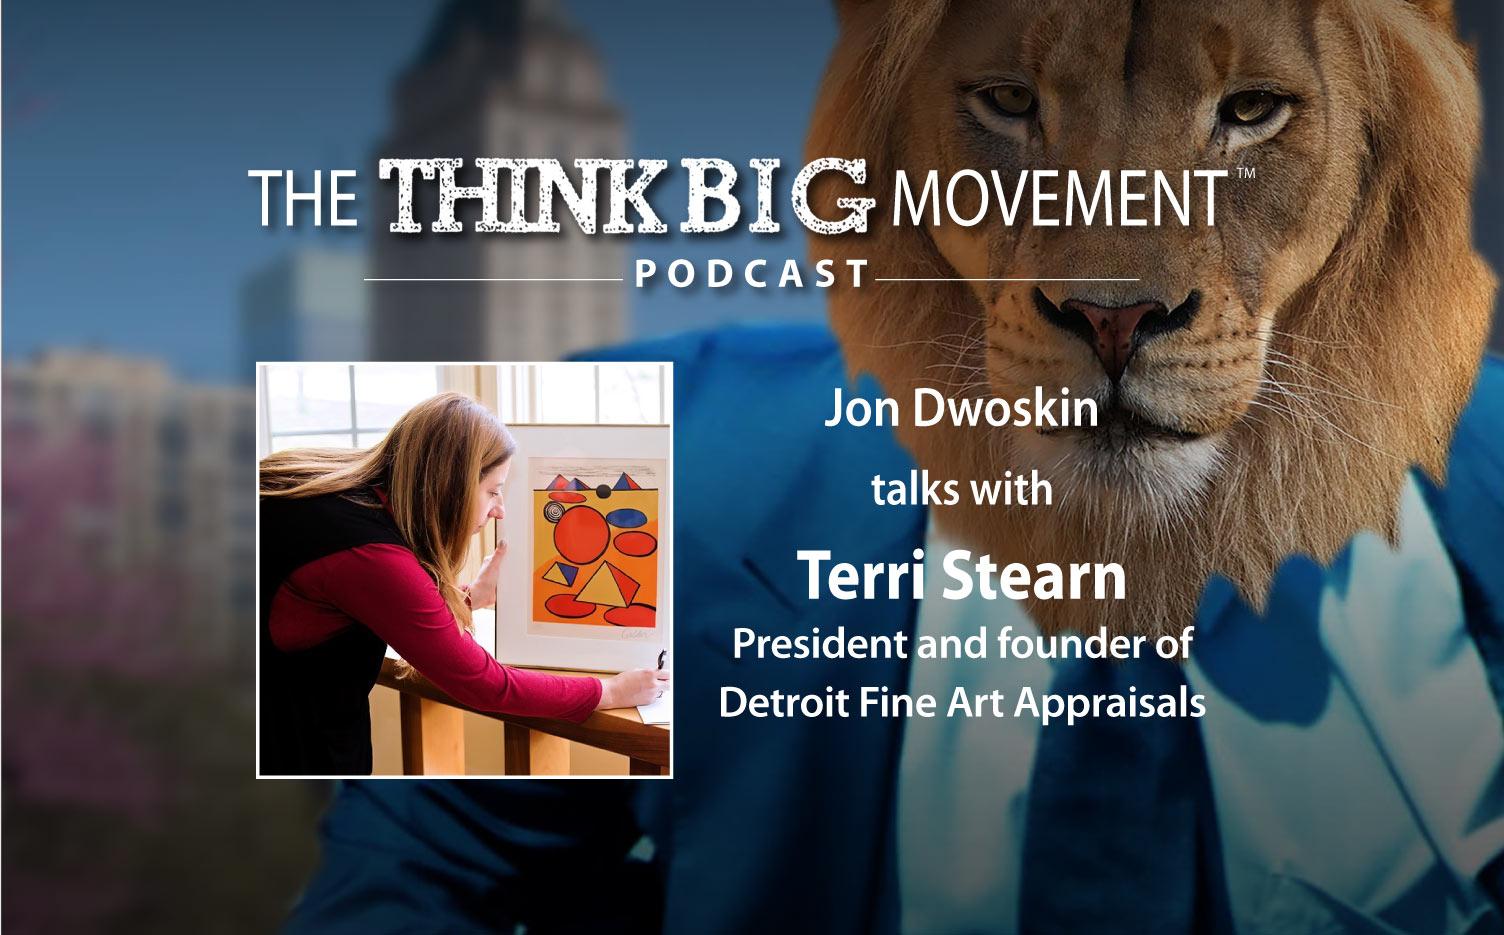 Think Big Movement Podcast - Jon Dwoskin Interviews Terri Stearn